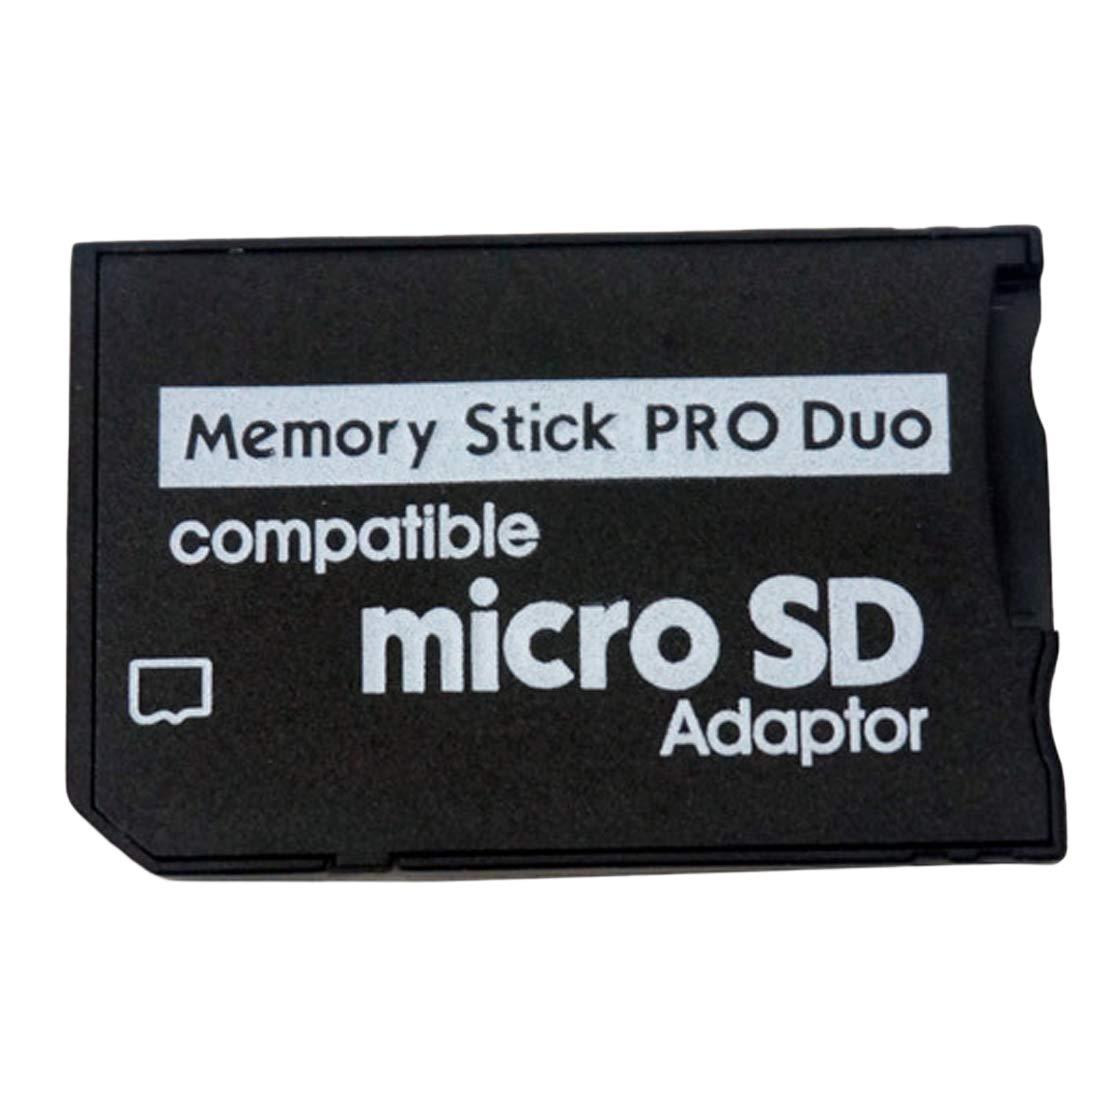 SD Micro Al Adaptador del Palillo del Adaptador De La Tarjeta De Memoria para PSP Sopport Class10 Micro SD 2Gb 4Gb 8Gb 16Gb 32Gb